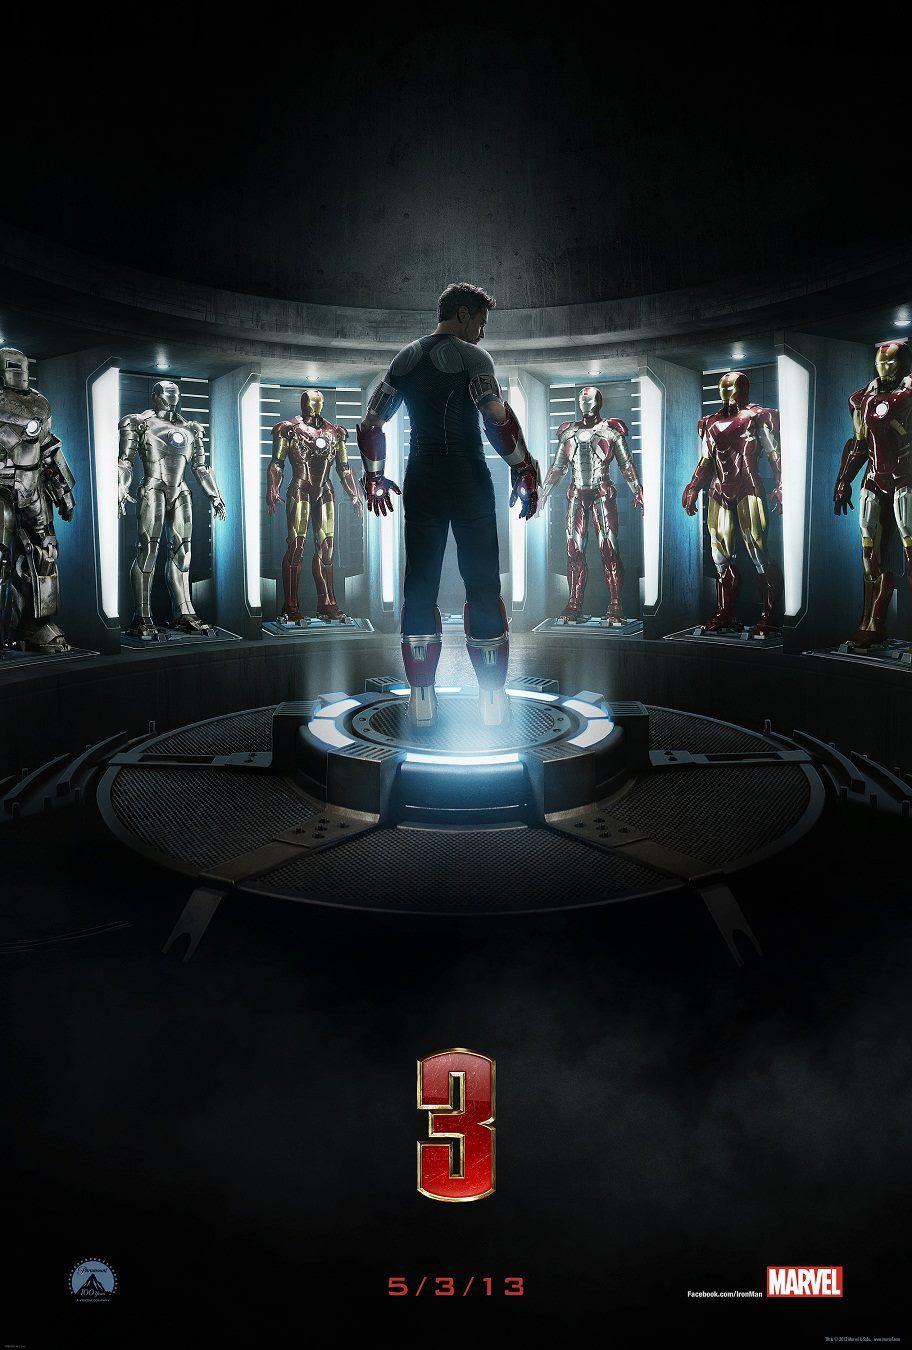 Iron Man 3 Iron Man 3 Poster Iron Man 3 Iron Man